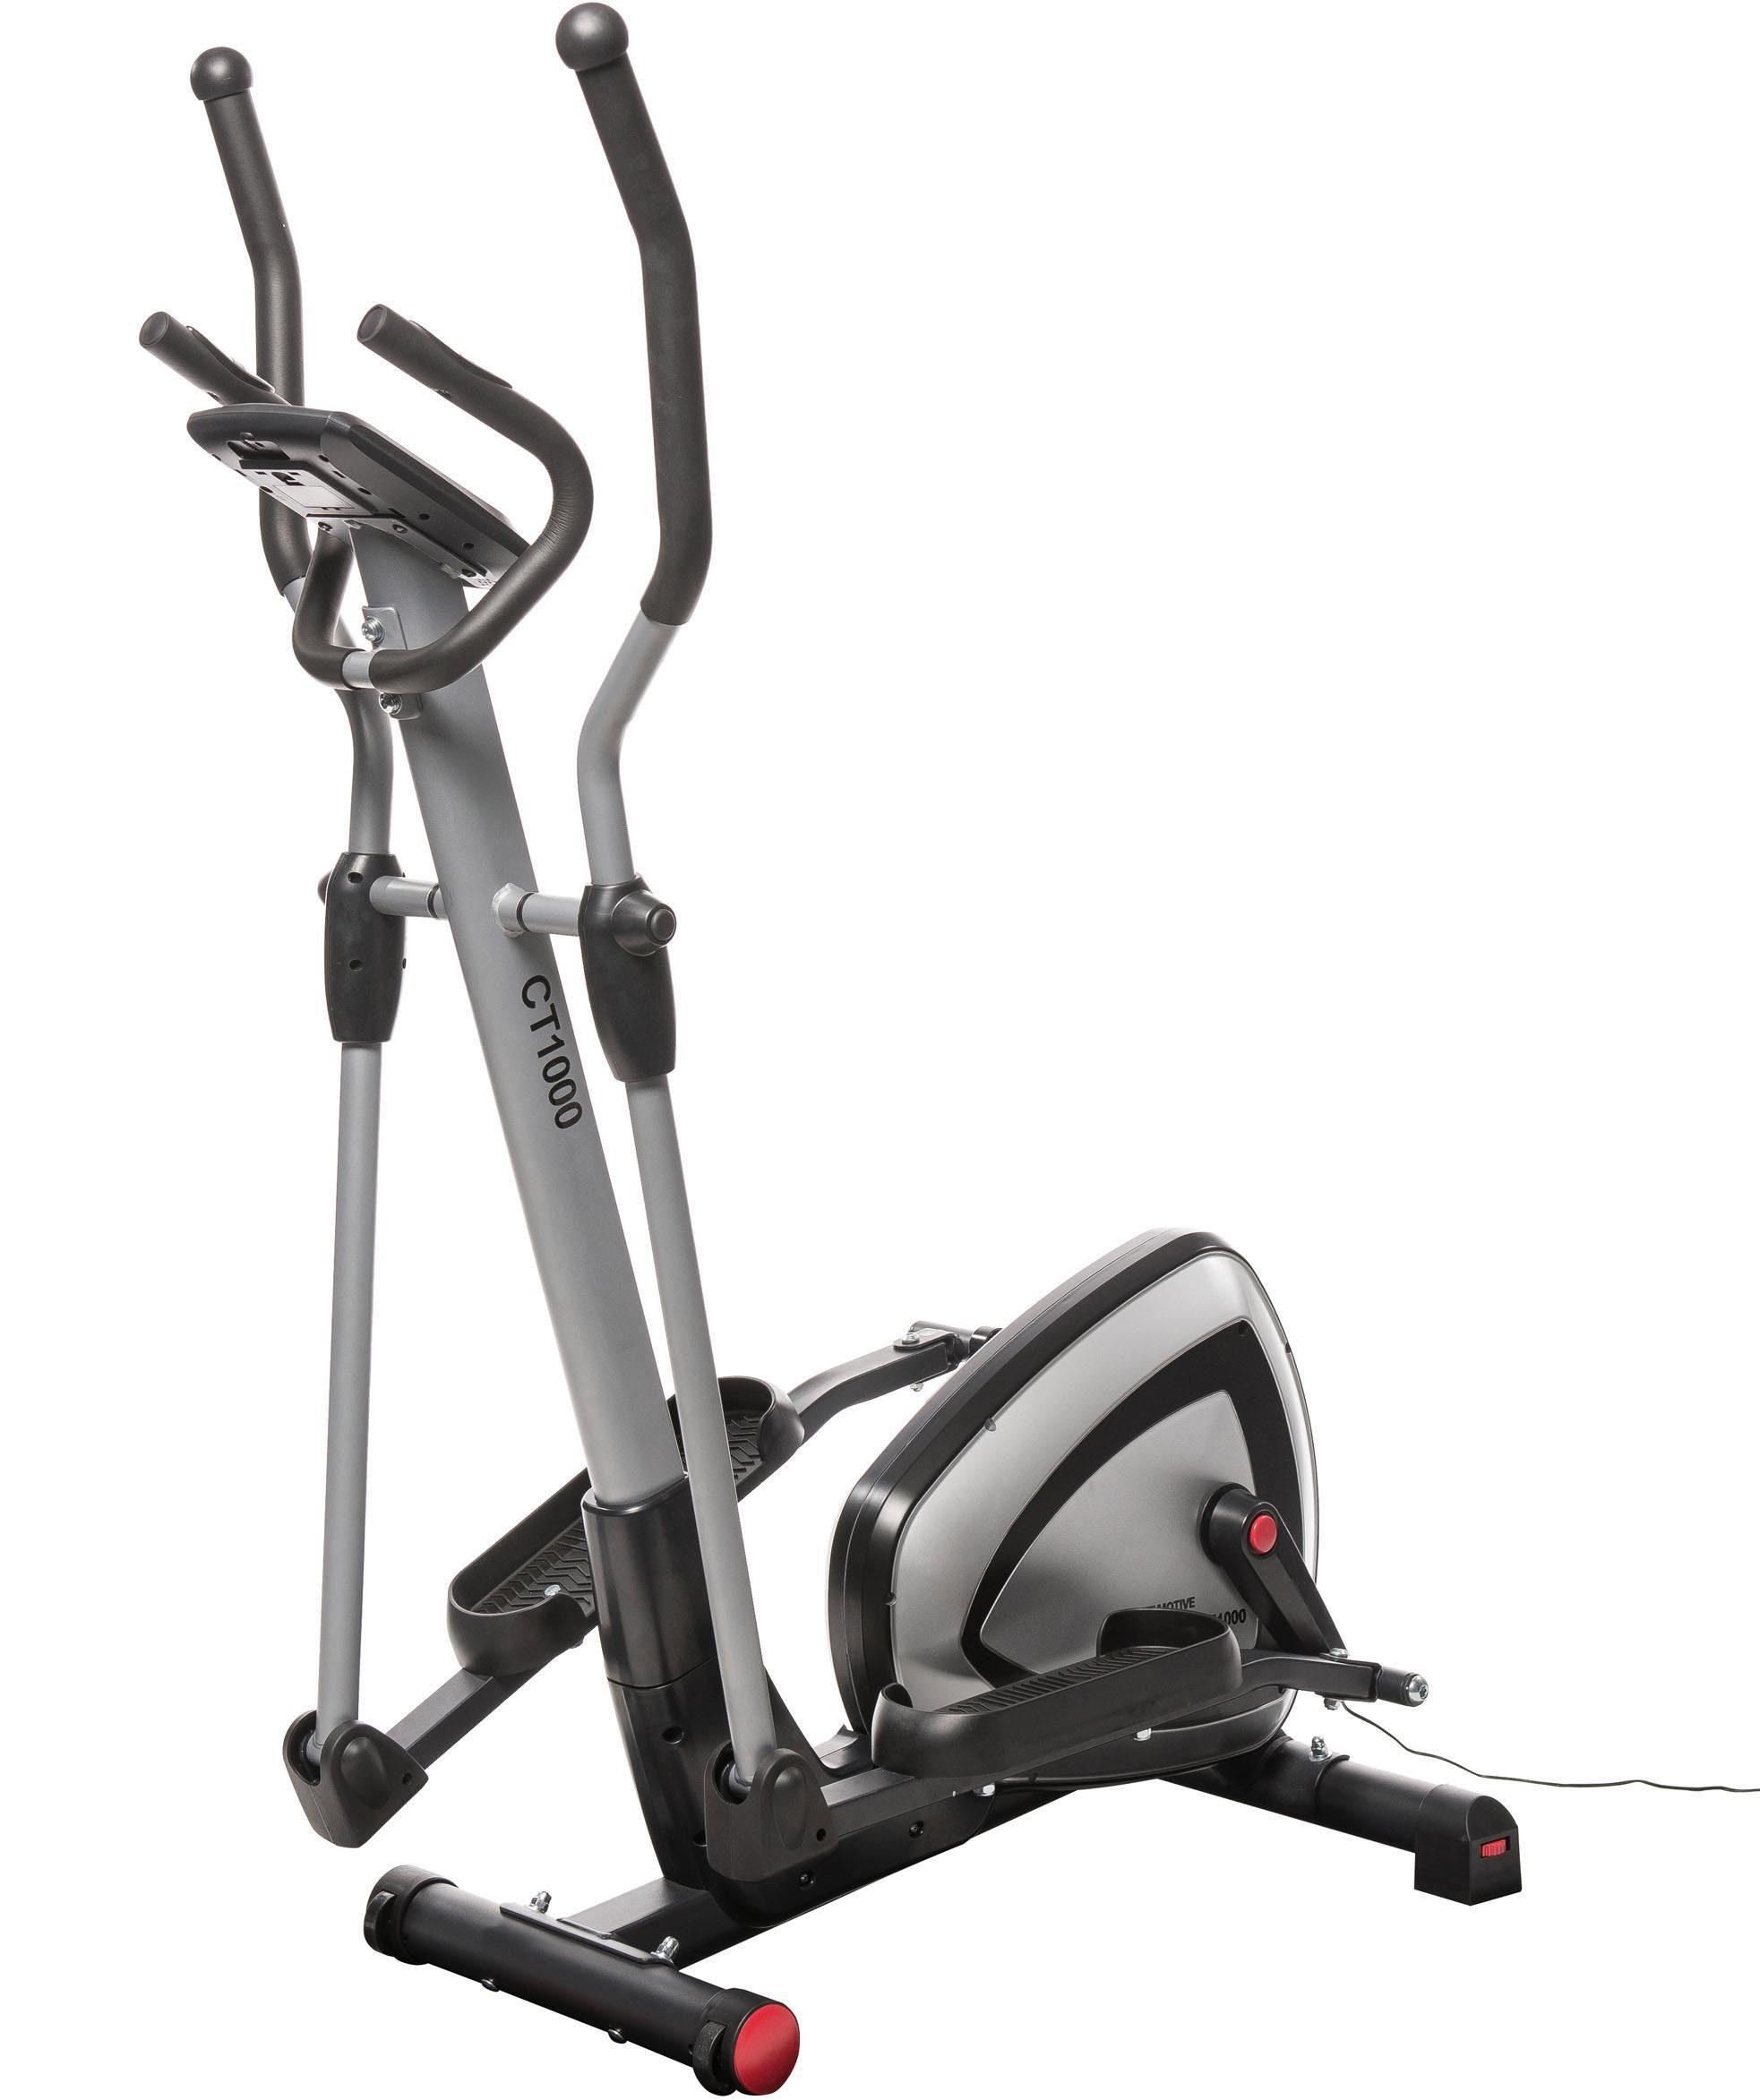 Crosstrainer CT 200 Ausdauertraining Motive Fitness by U.N.O